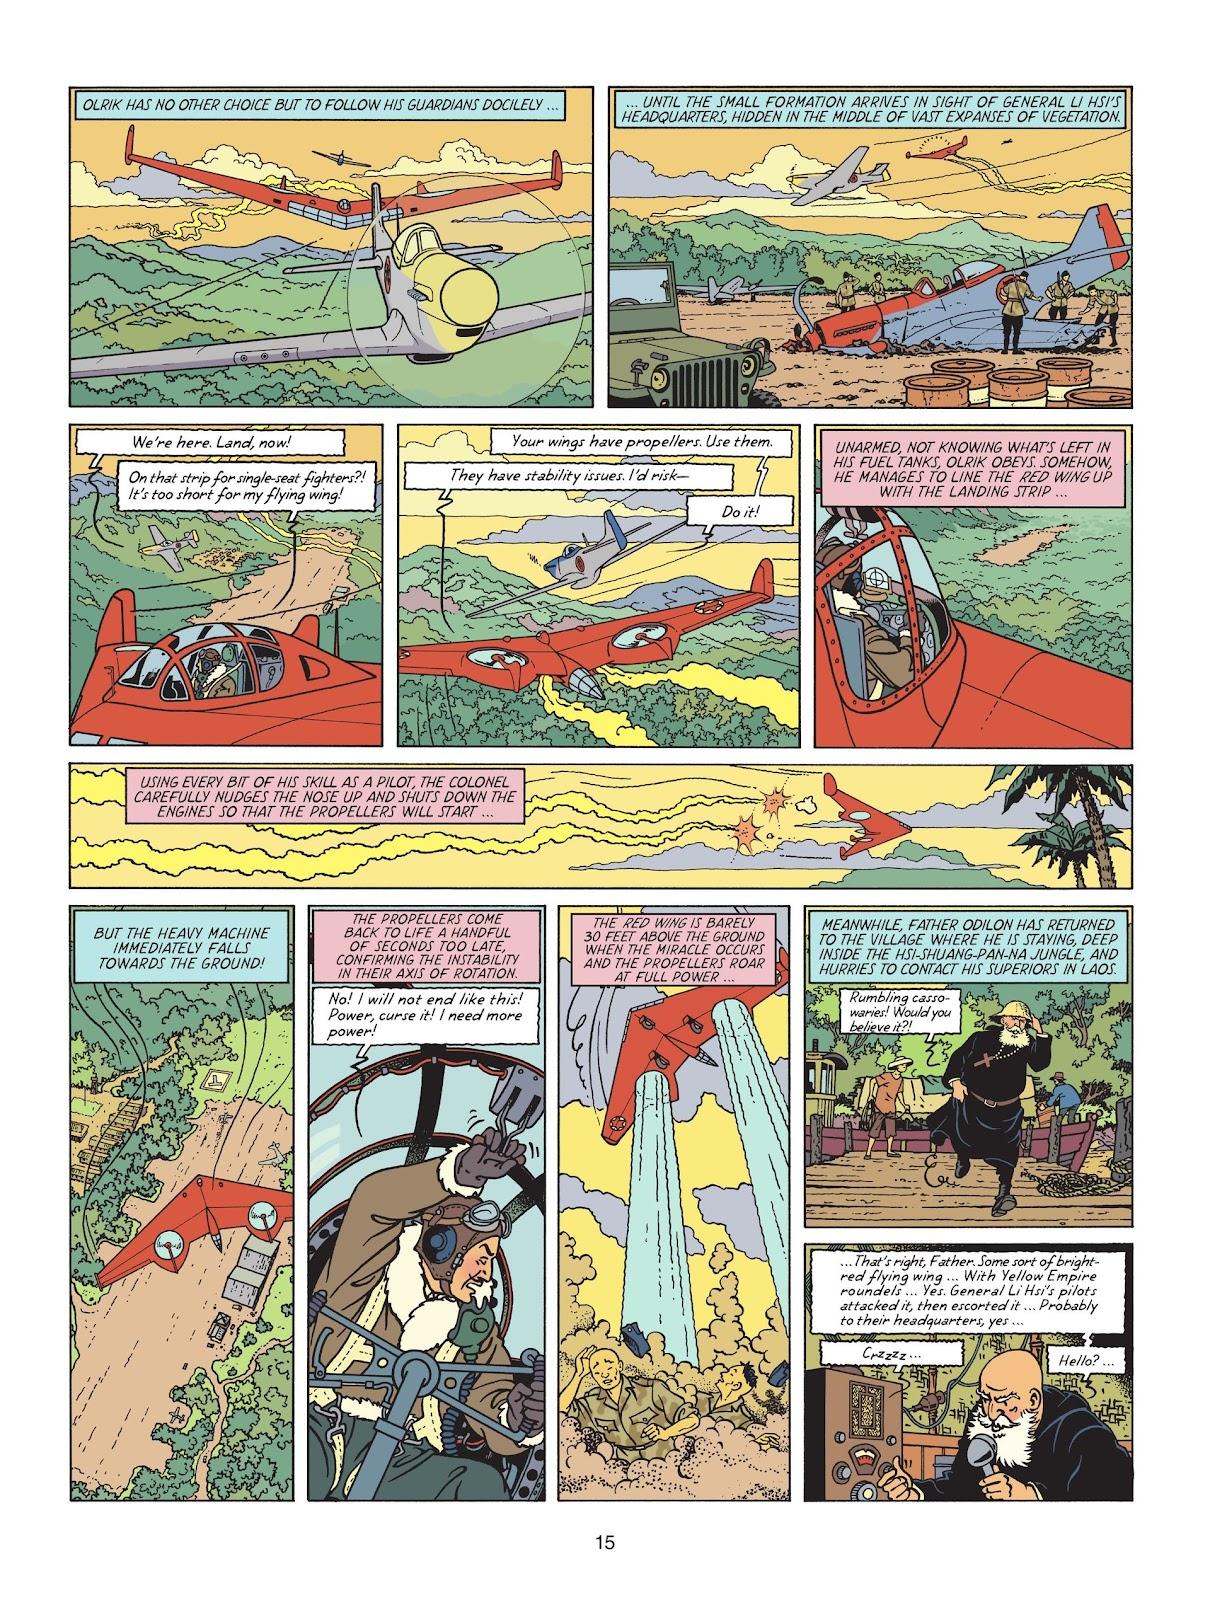 Read online Blake & Mortimer comic -  Issue #25 - 17